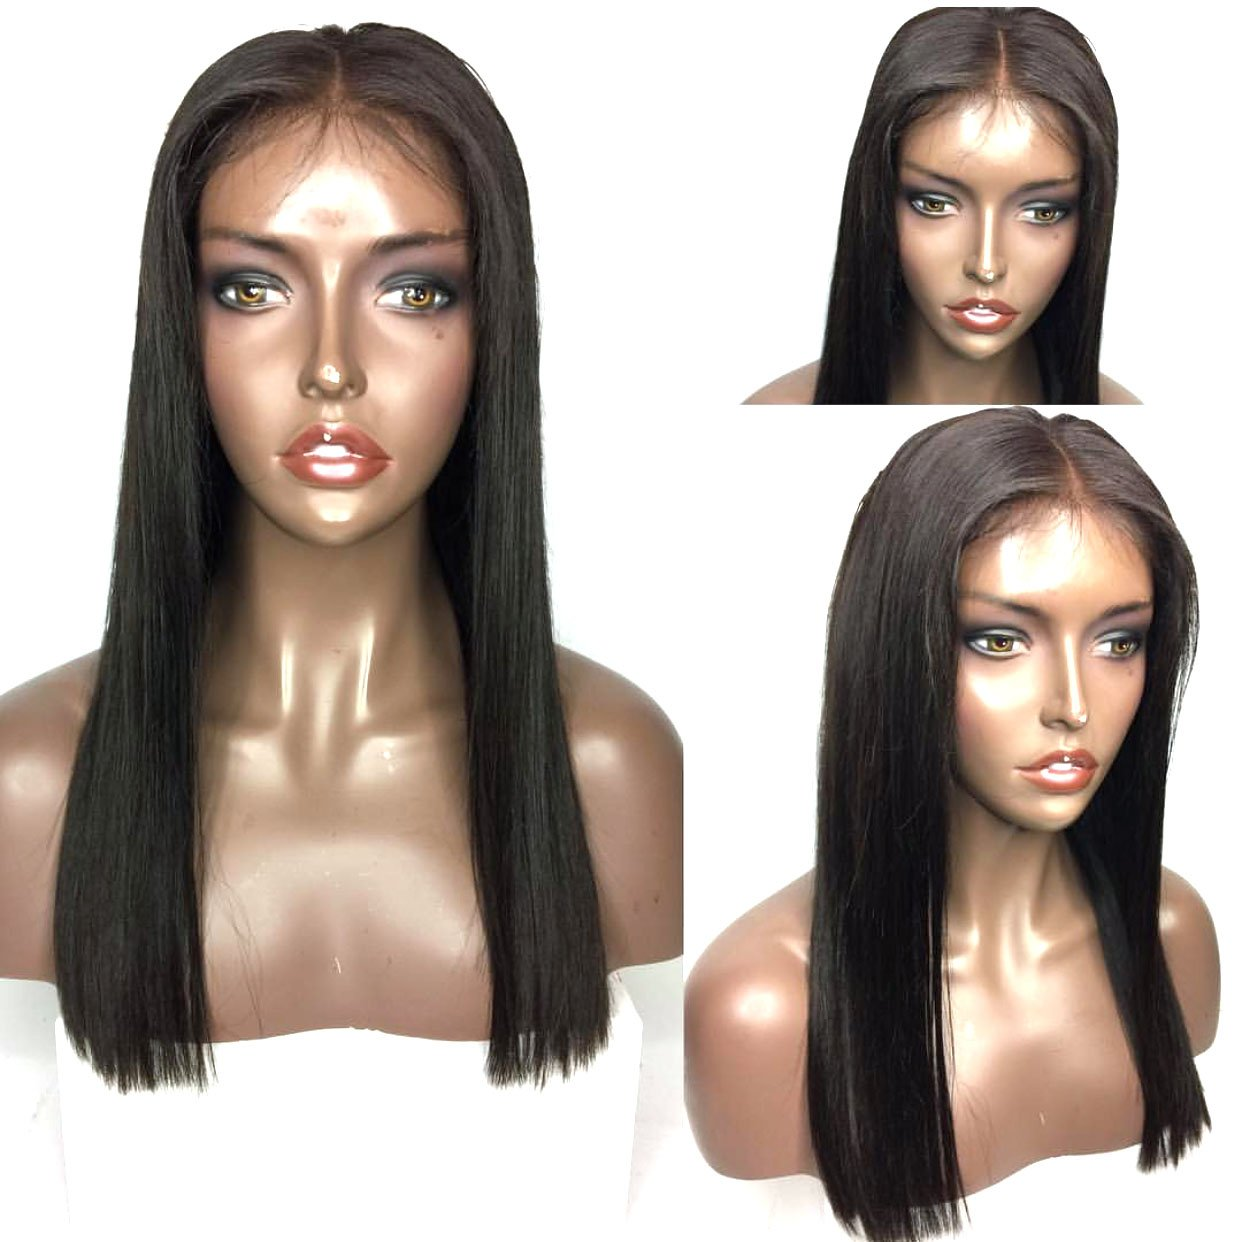 Amazon.com   AllHairz Glueless Short Hair Cute Lace Front Human Hair Wig  Brazilian Hair Bob Wigs for Black Women with Baby Hair Straight Short Hair  Human ... 7fa07dbfd